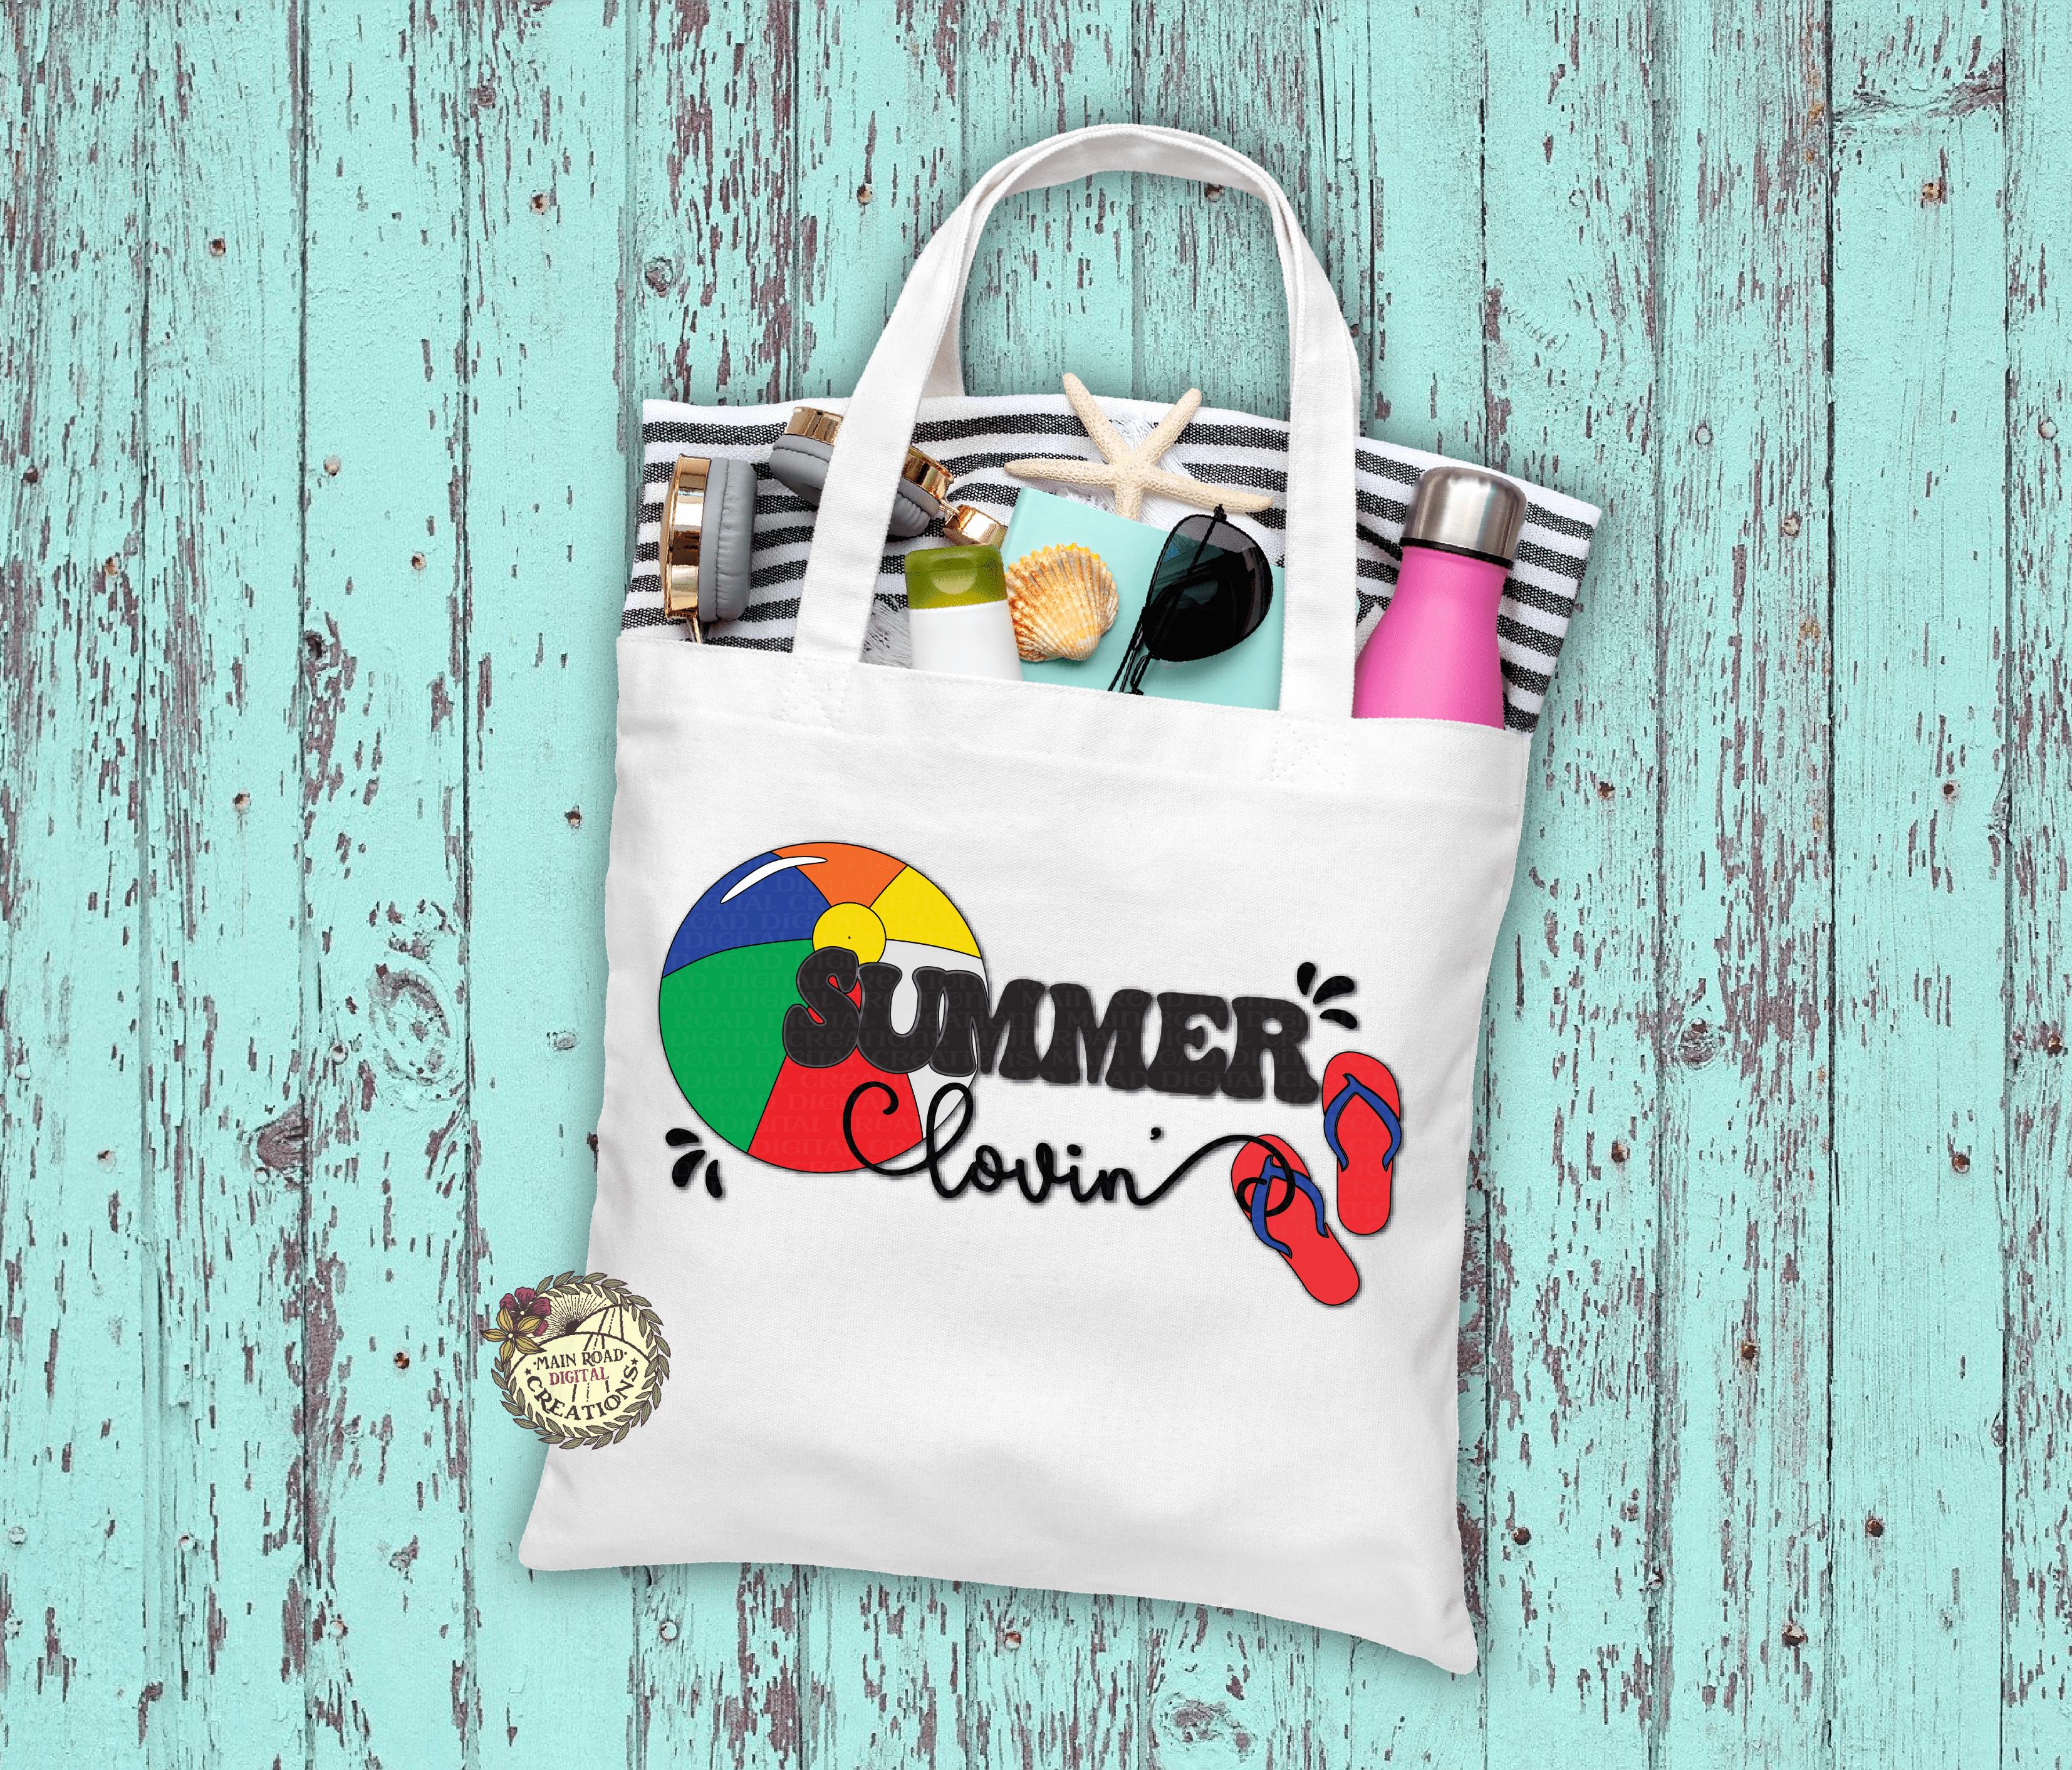 free summer lovin svg, summer lovin beach bag, free beach ball svg, free flip flops svg, free summer cut file